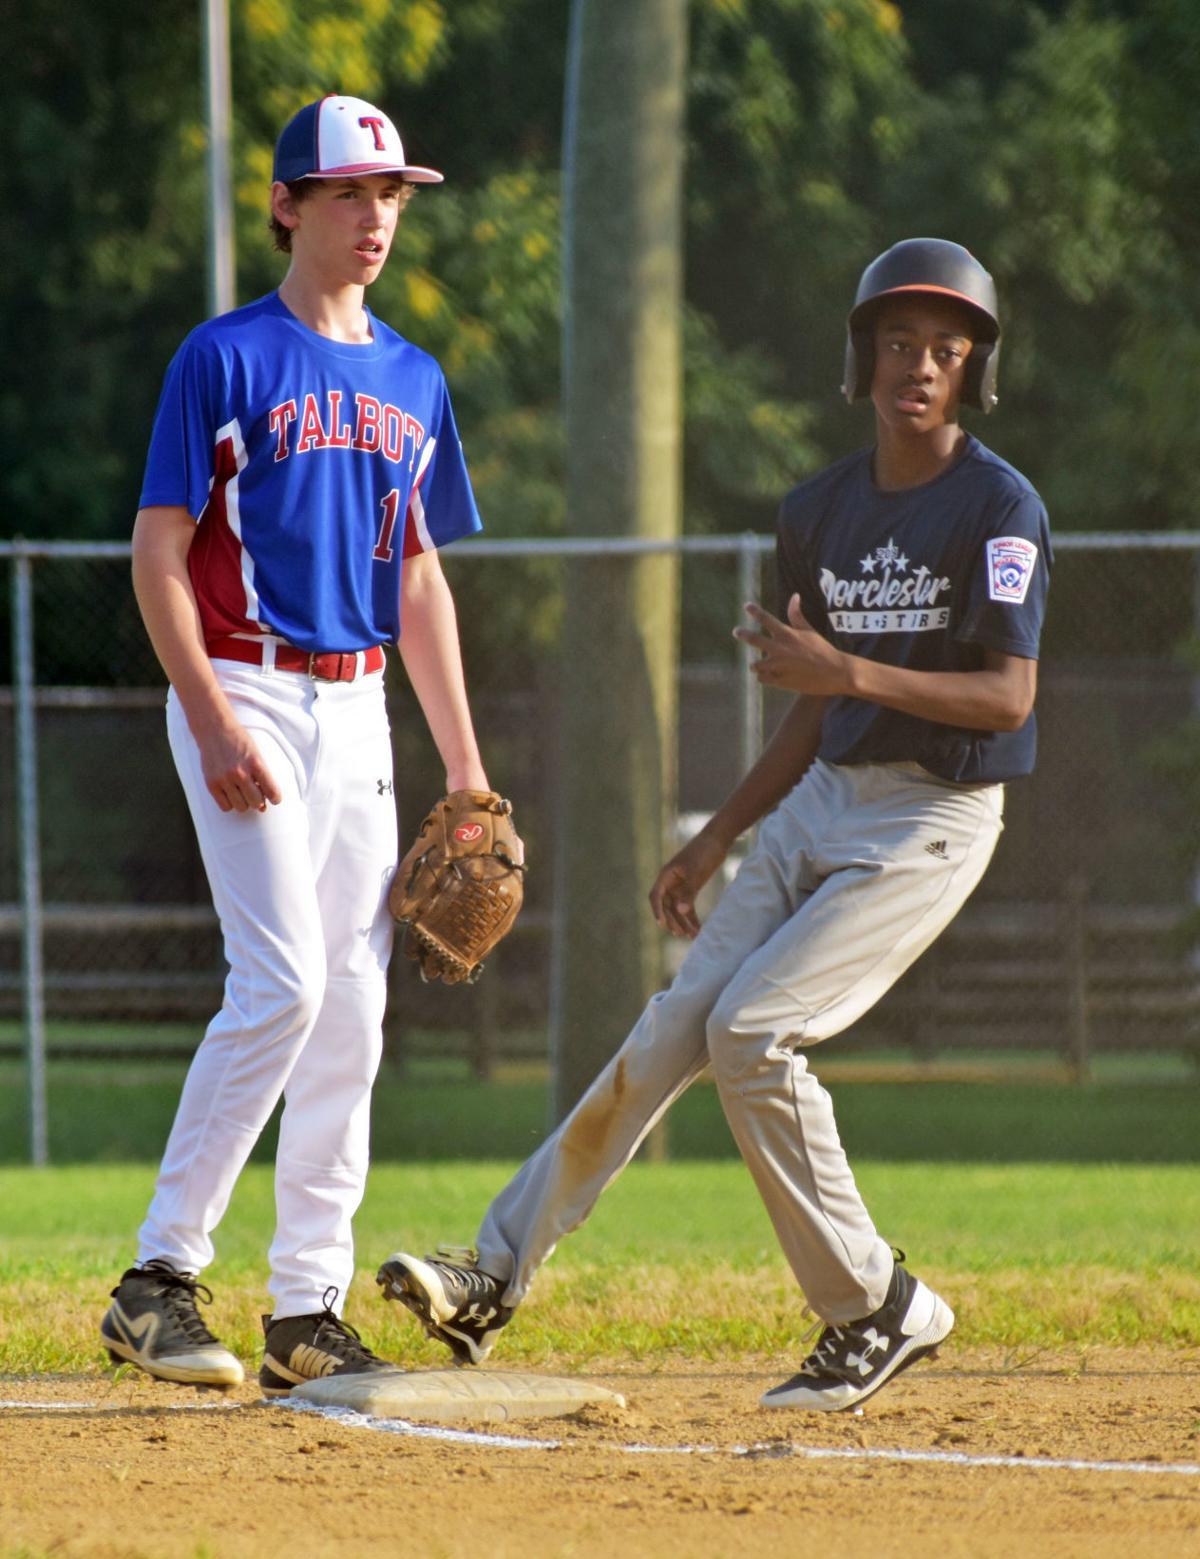 2019 District 6 Junior League Baseball Championship: Dorchester vs. Talbot, July 9, 2019